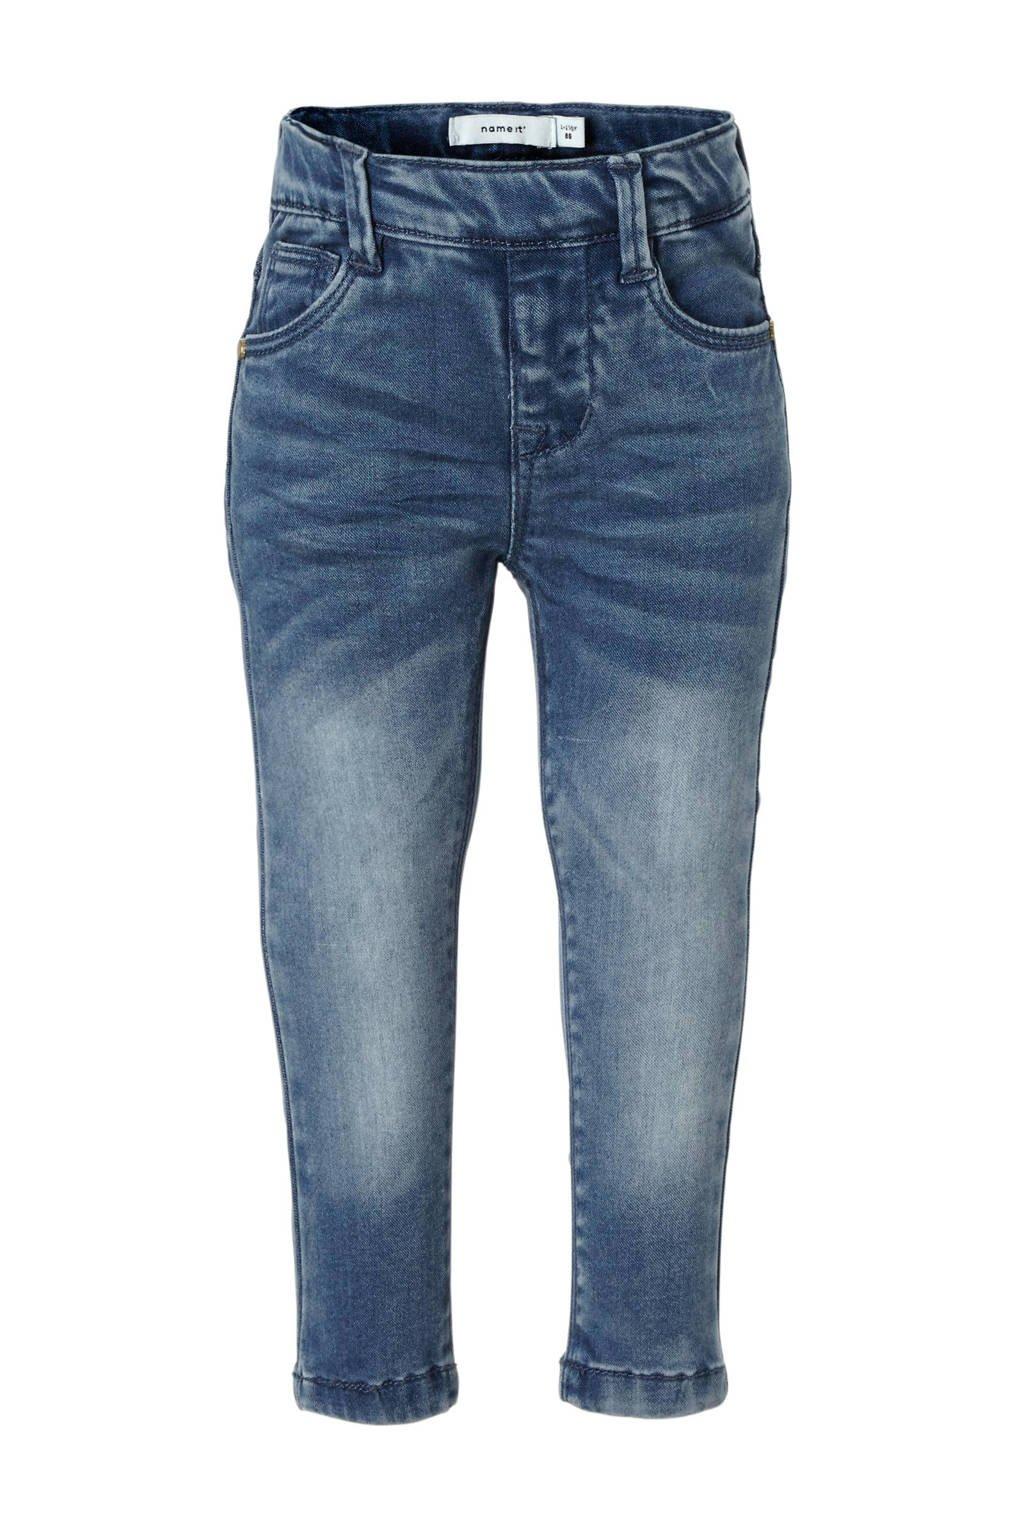 name it MINI skinny fit jeans Polly, Medium blue